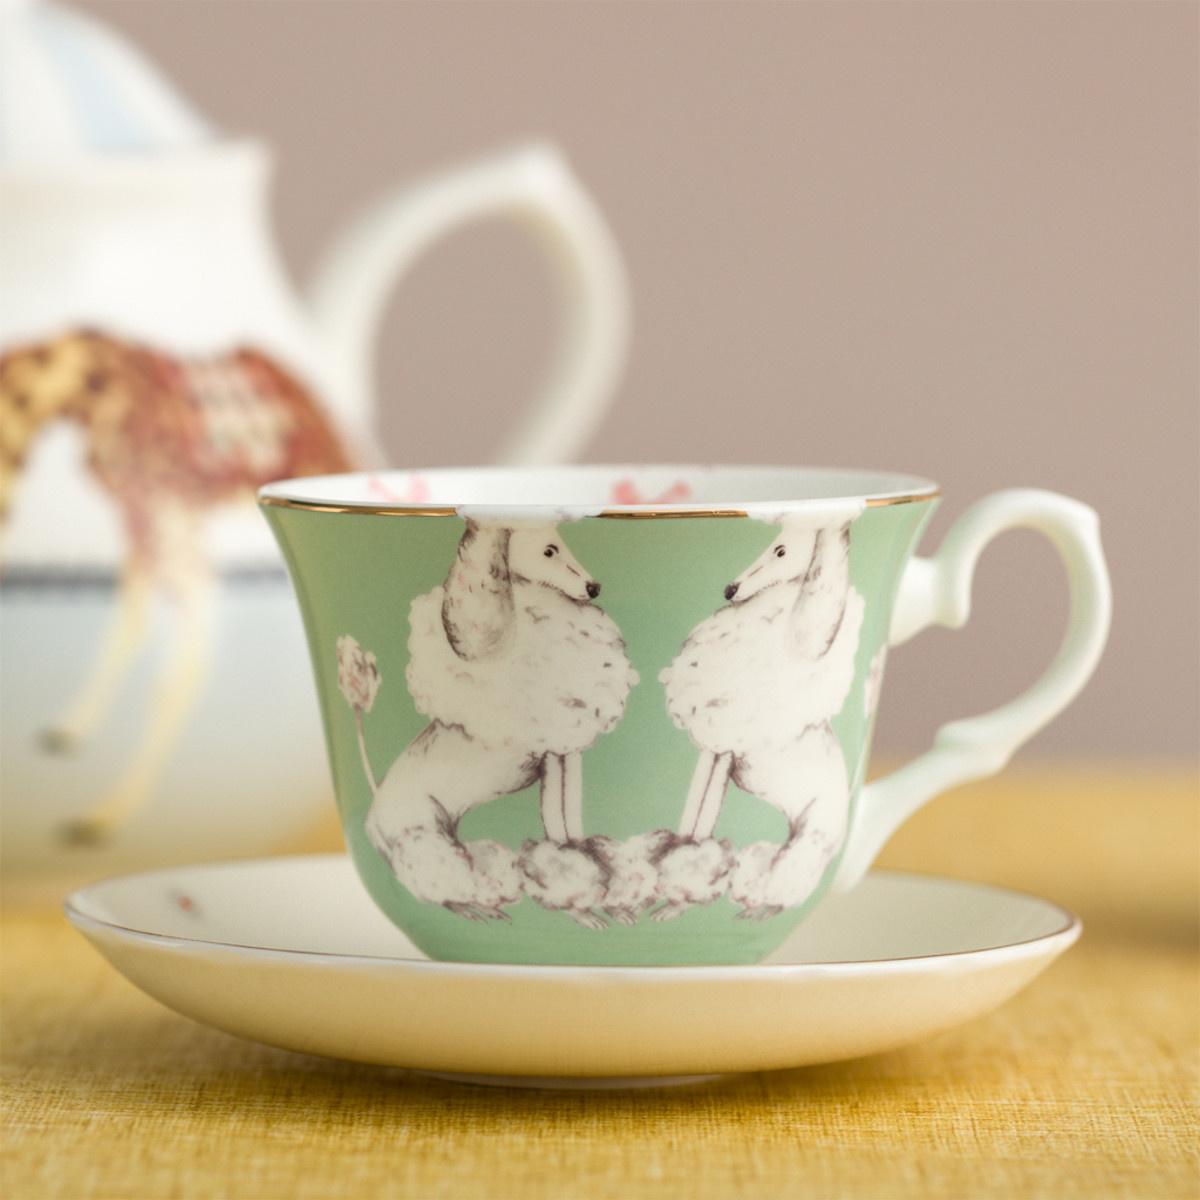 Yvonne Ellen London Yvonne Ellen London Carnival Animal Set de 2 Mugs 375 ml - Bone China Porcelaine - Boîte de Cadeau - Copy